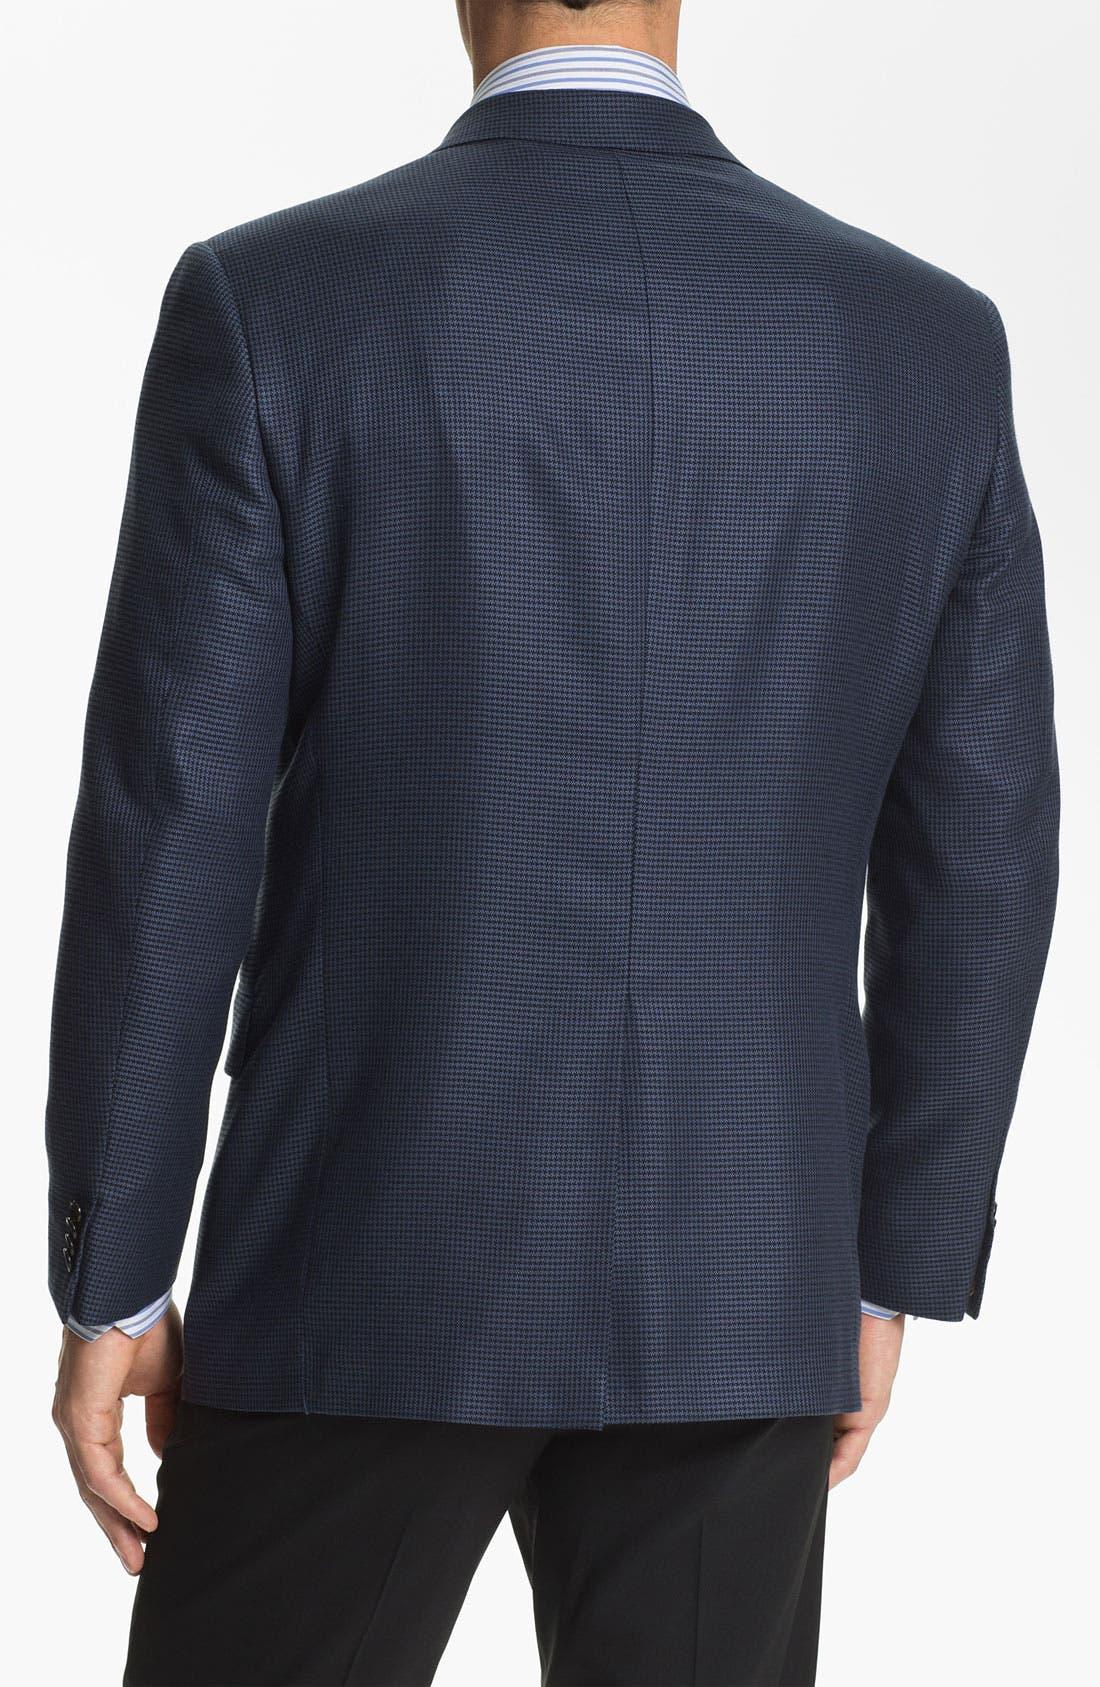 Alternate Image 2  - Hart Schaffner Marx Silk Blend Sportcoat